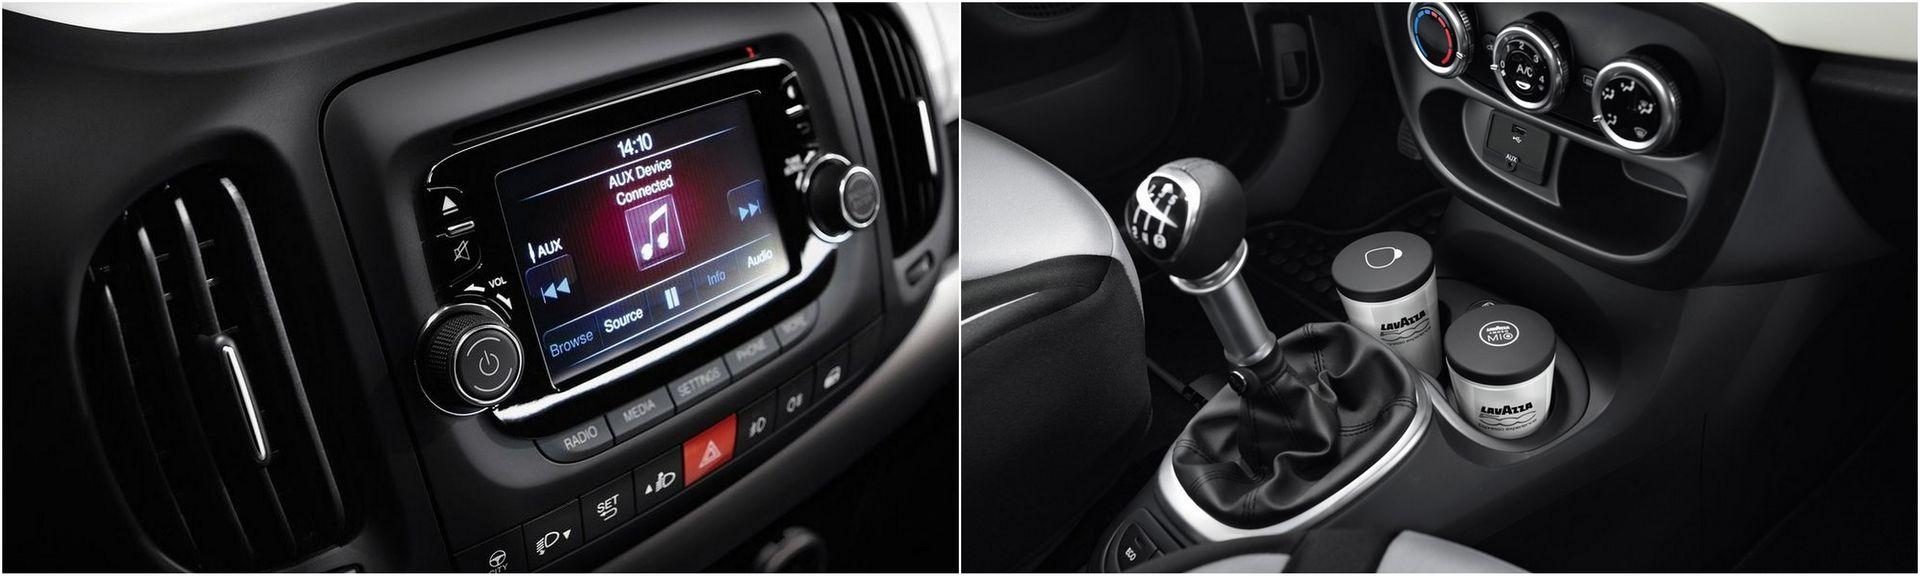 FIAT 000L — интерьер, мультимедия UConnect равно разъемы AUX/USB